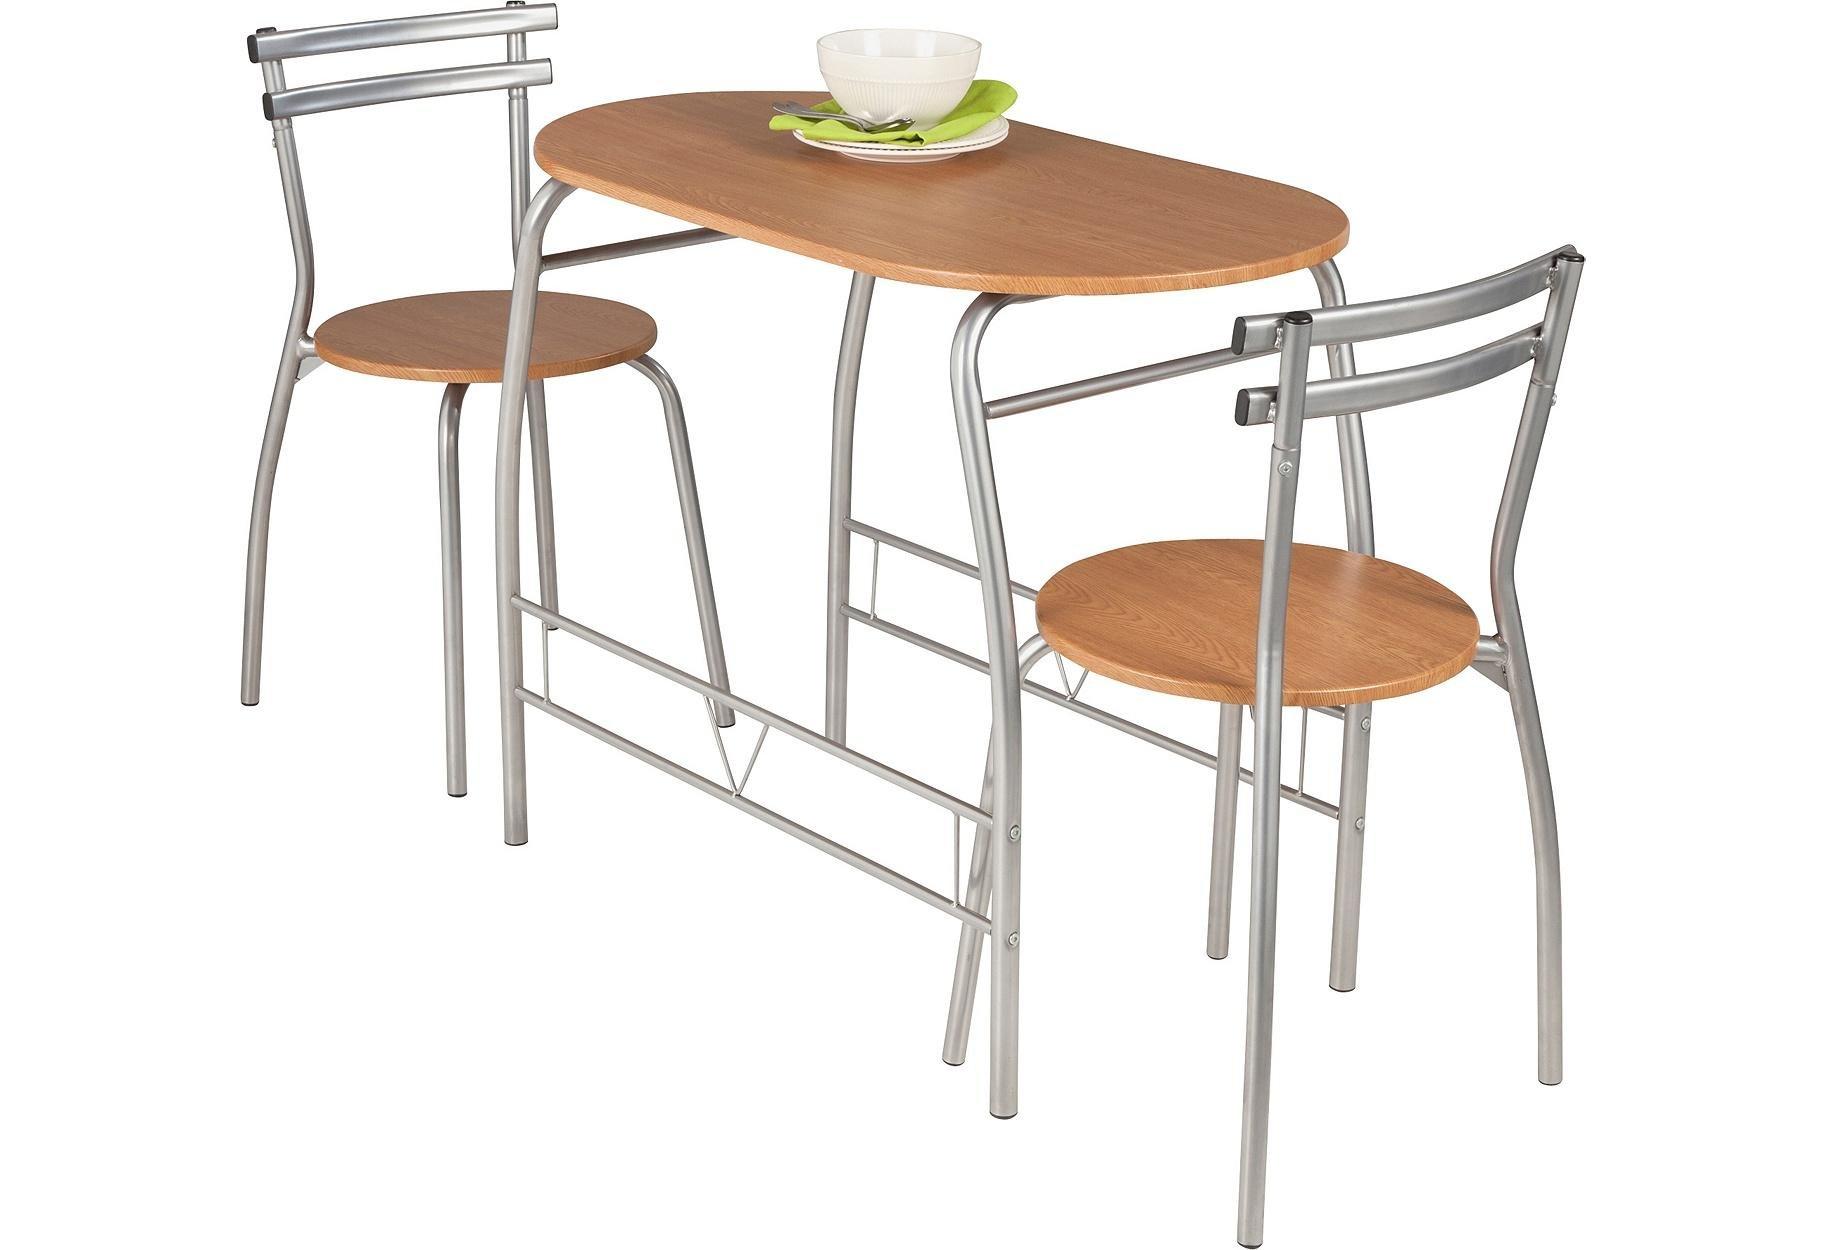 Sale On Argos Home Vegas Oak Effect Dining Table 2